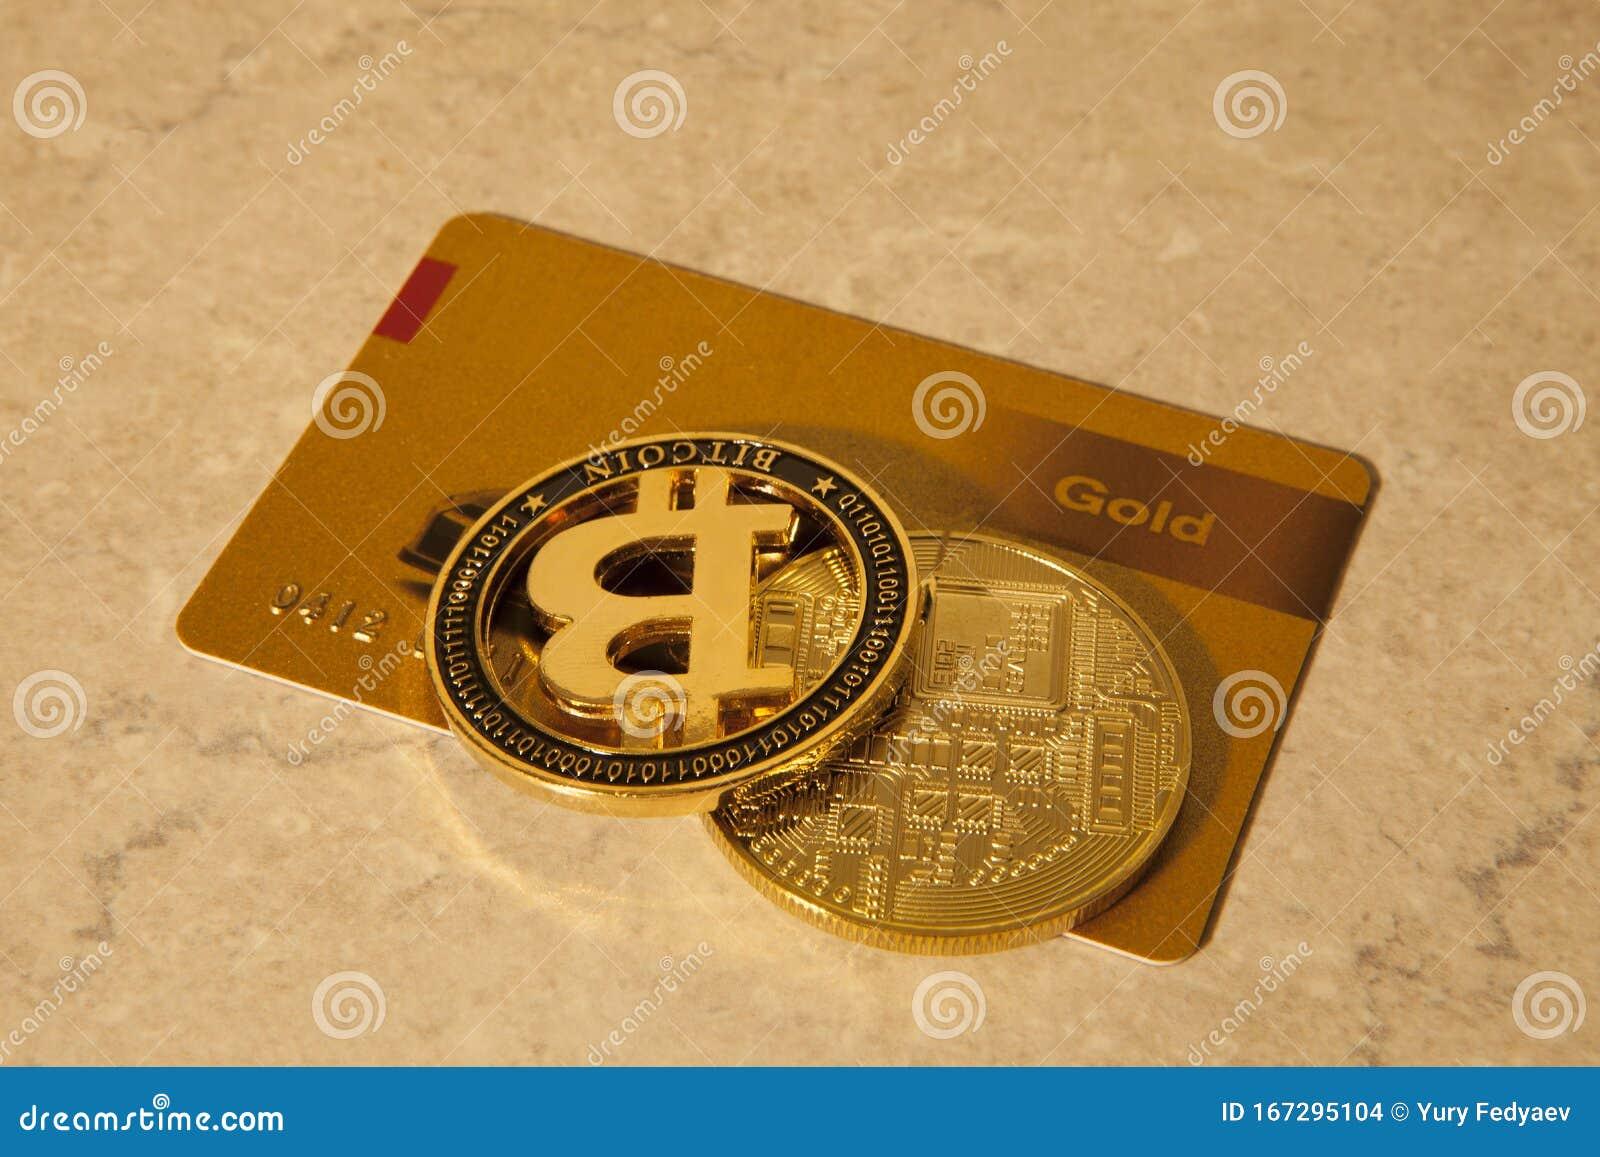 bitcoin photo id